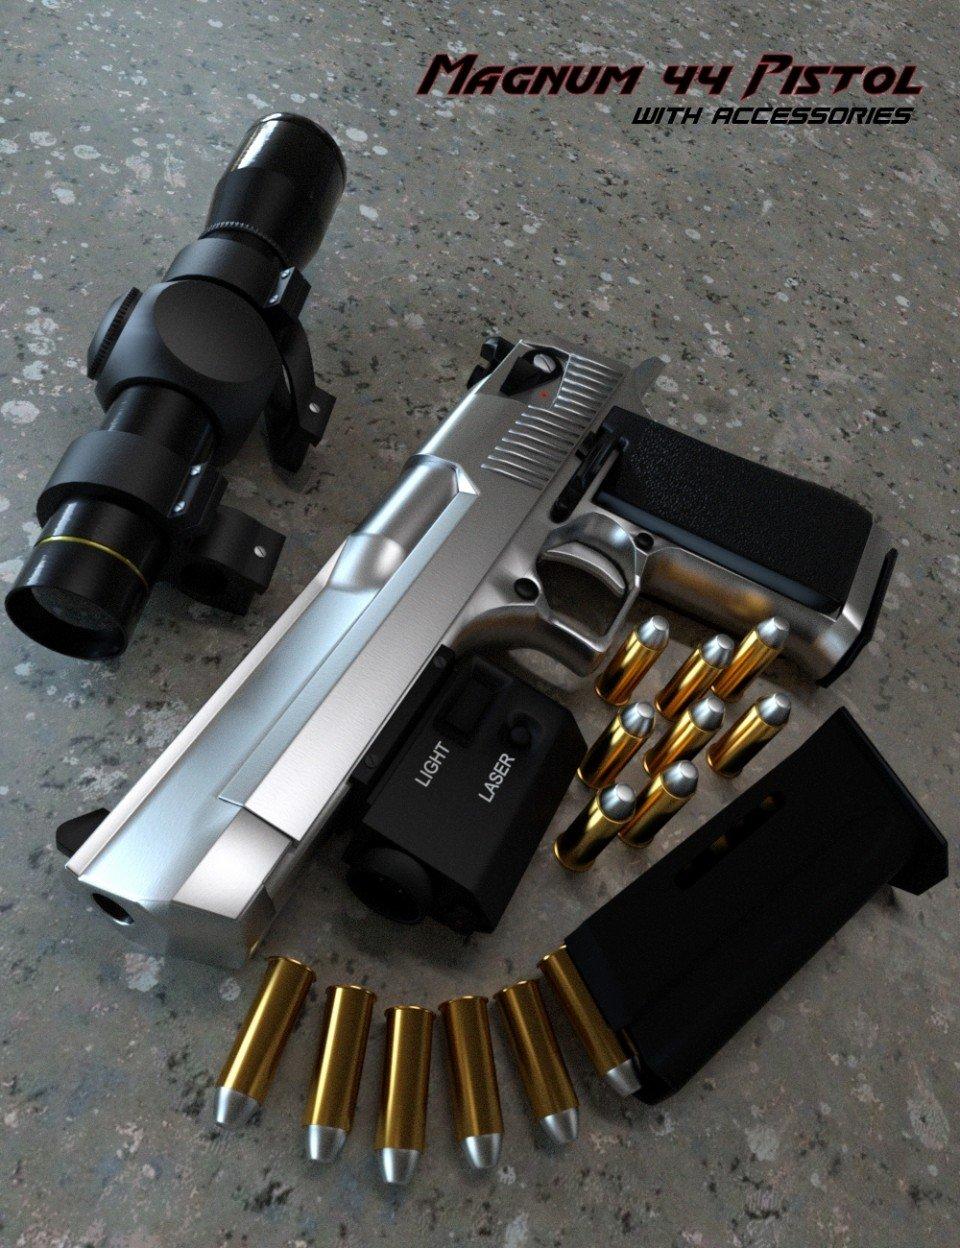 Magnum 44 Pistol with Accessories_DAZ3D下载站